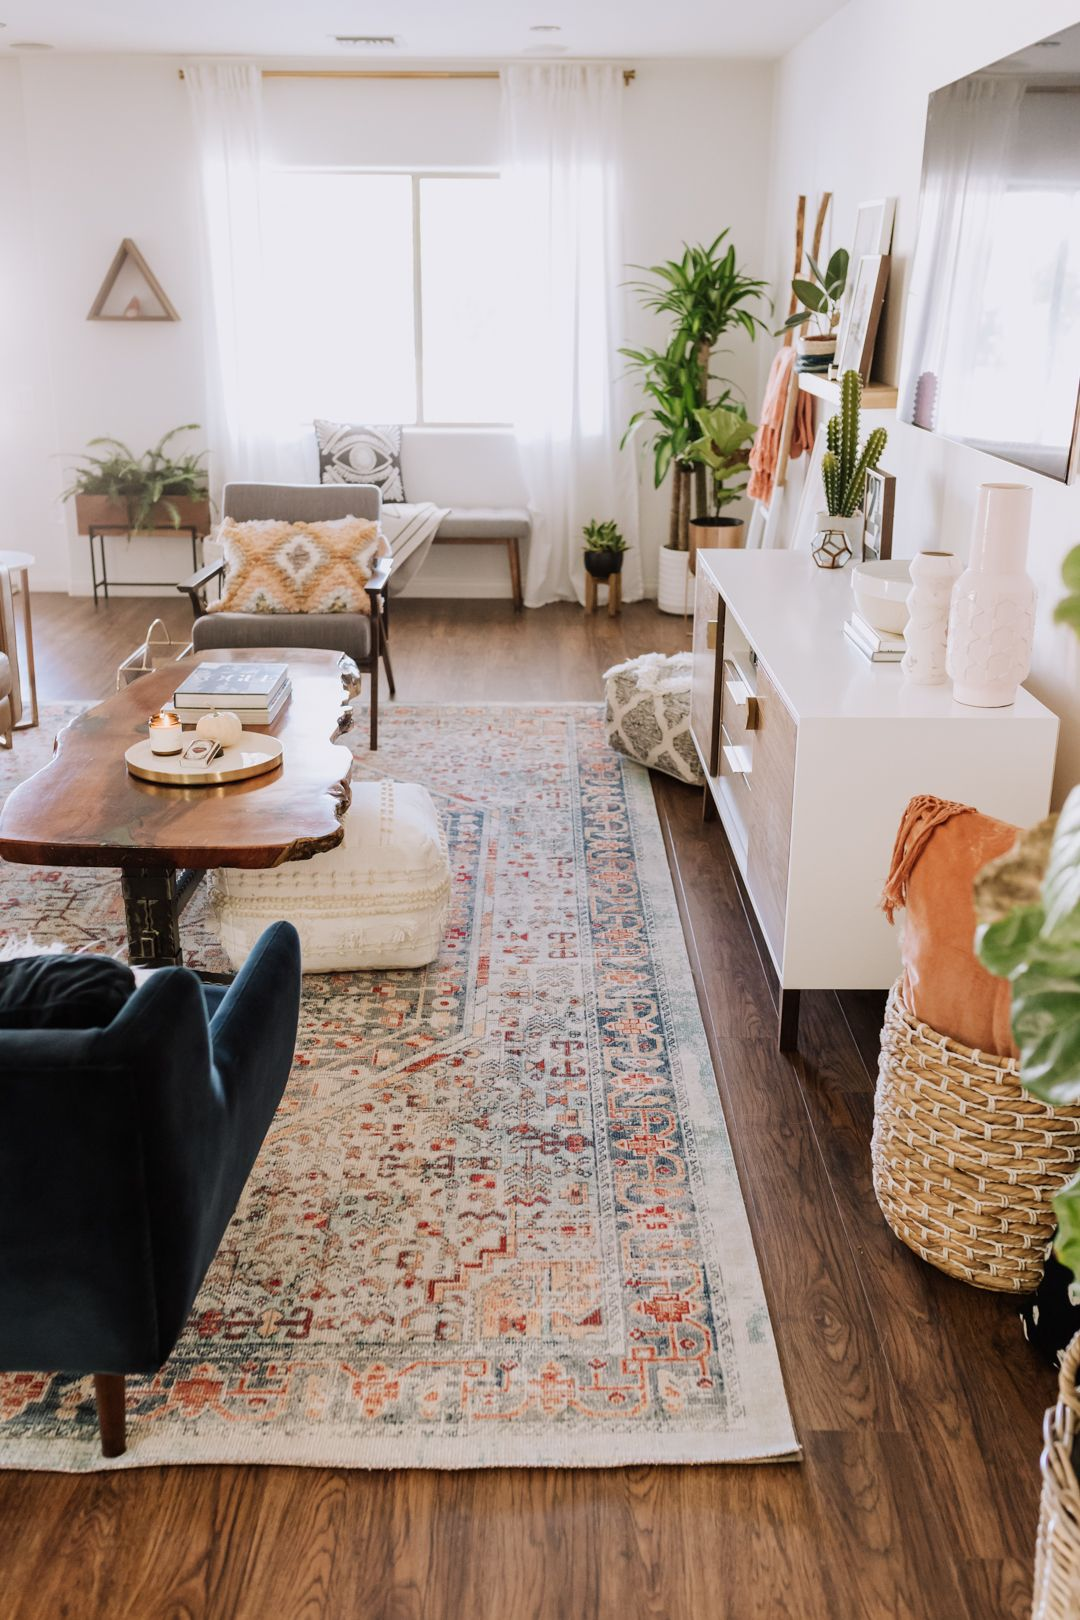 gorgeous rug from loloi | thelovedesignedlife.com #arearug #livingroom #interiordesign